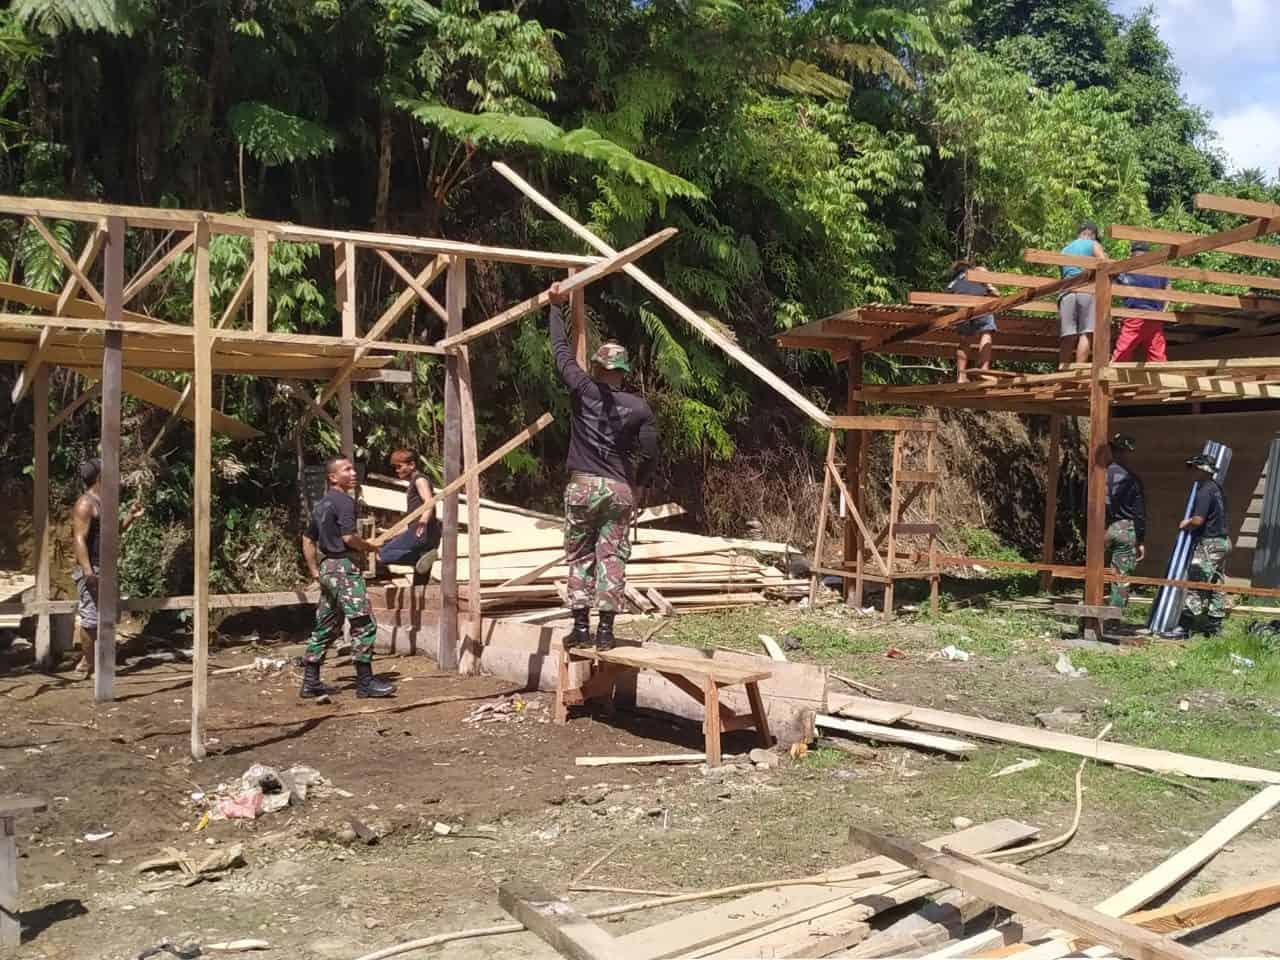 Bedah Rumah, Bakti Satgas Yonif R 300 Bagi Warga Papua